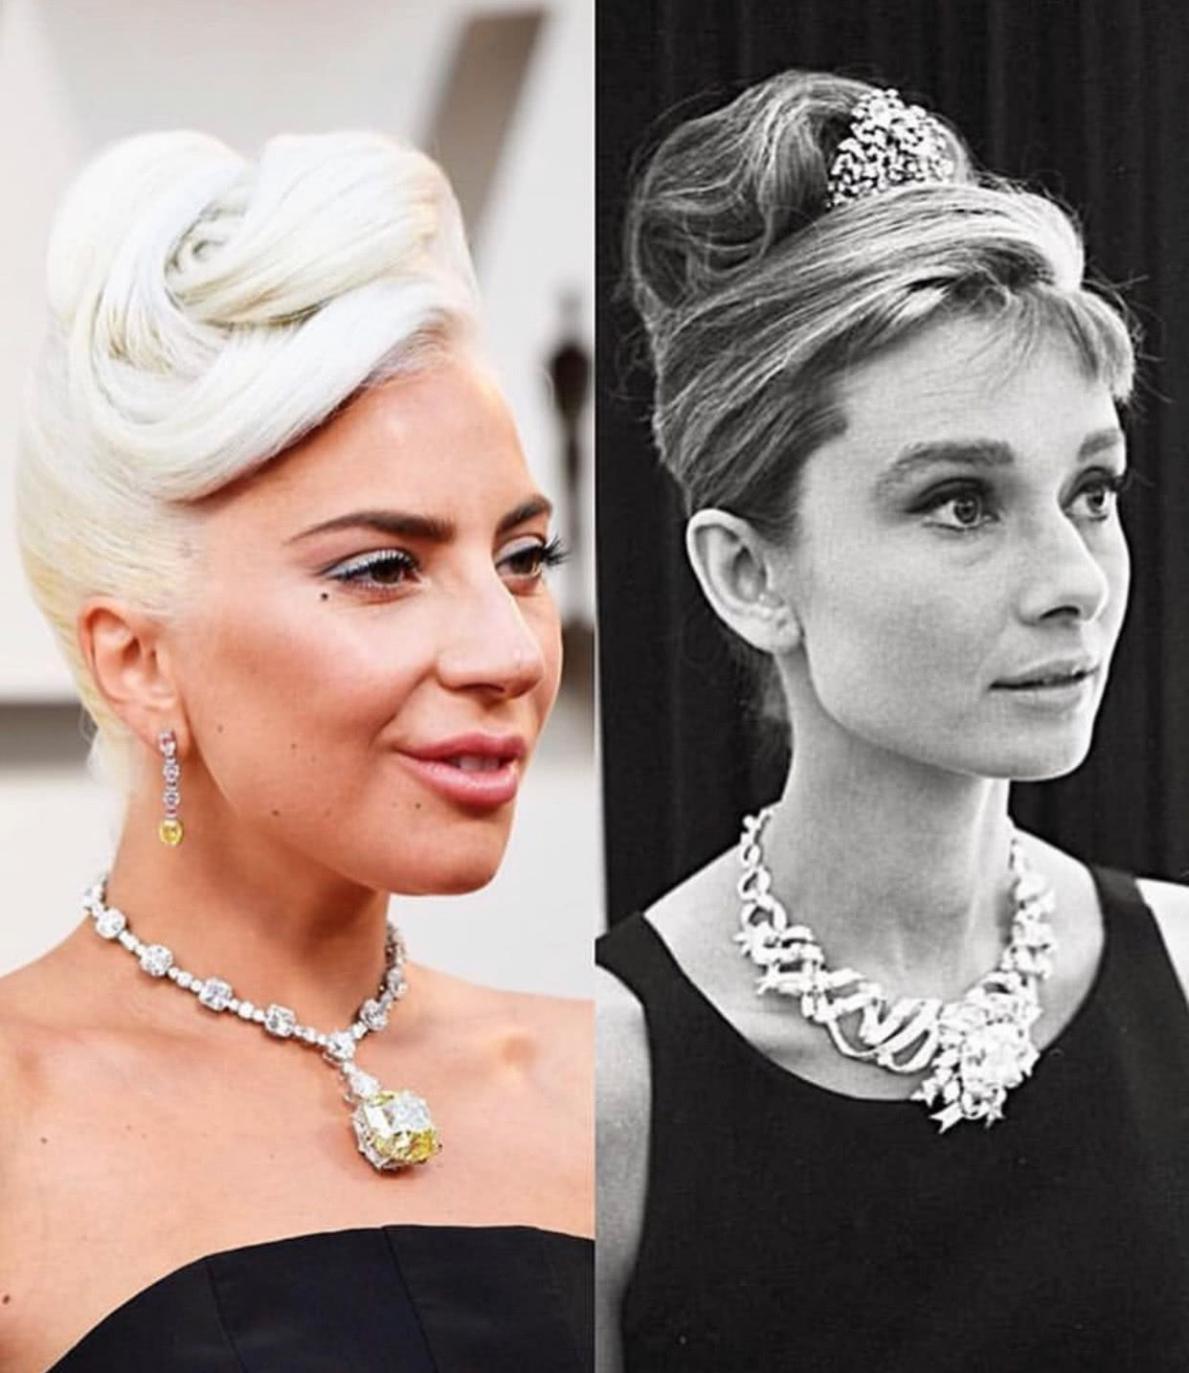 LadyGaga胸前钻石项链亮了,顶级珍品价值上亿,全球仅三人佩戴过